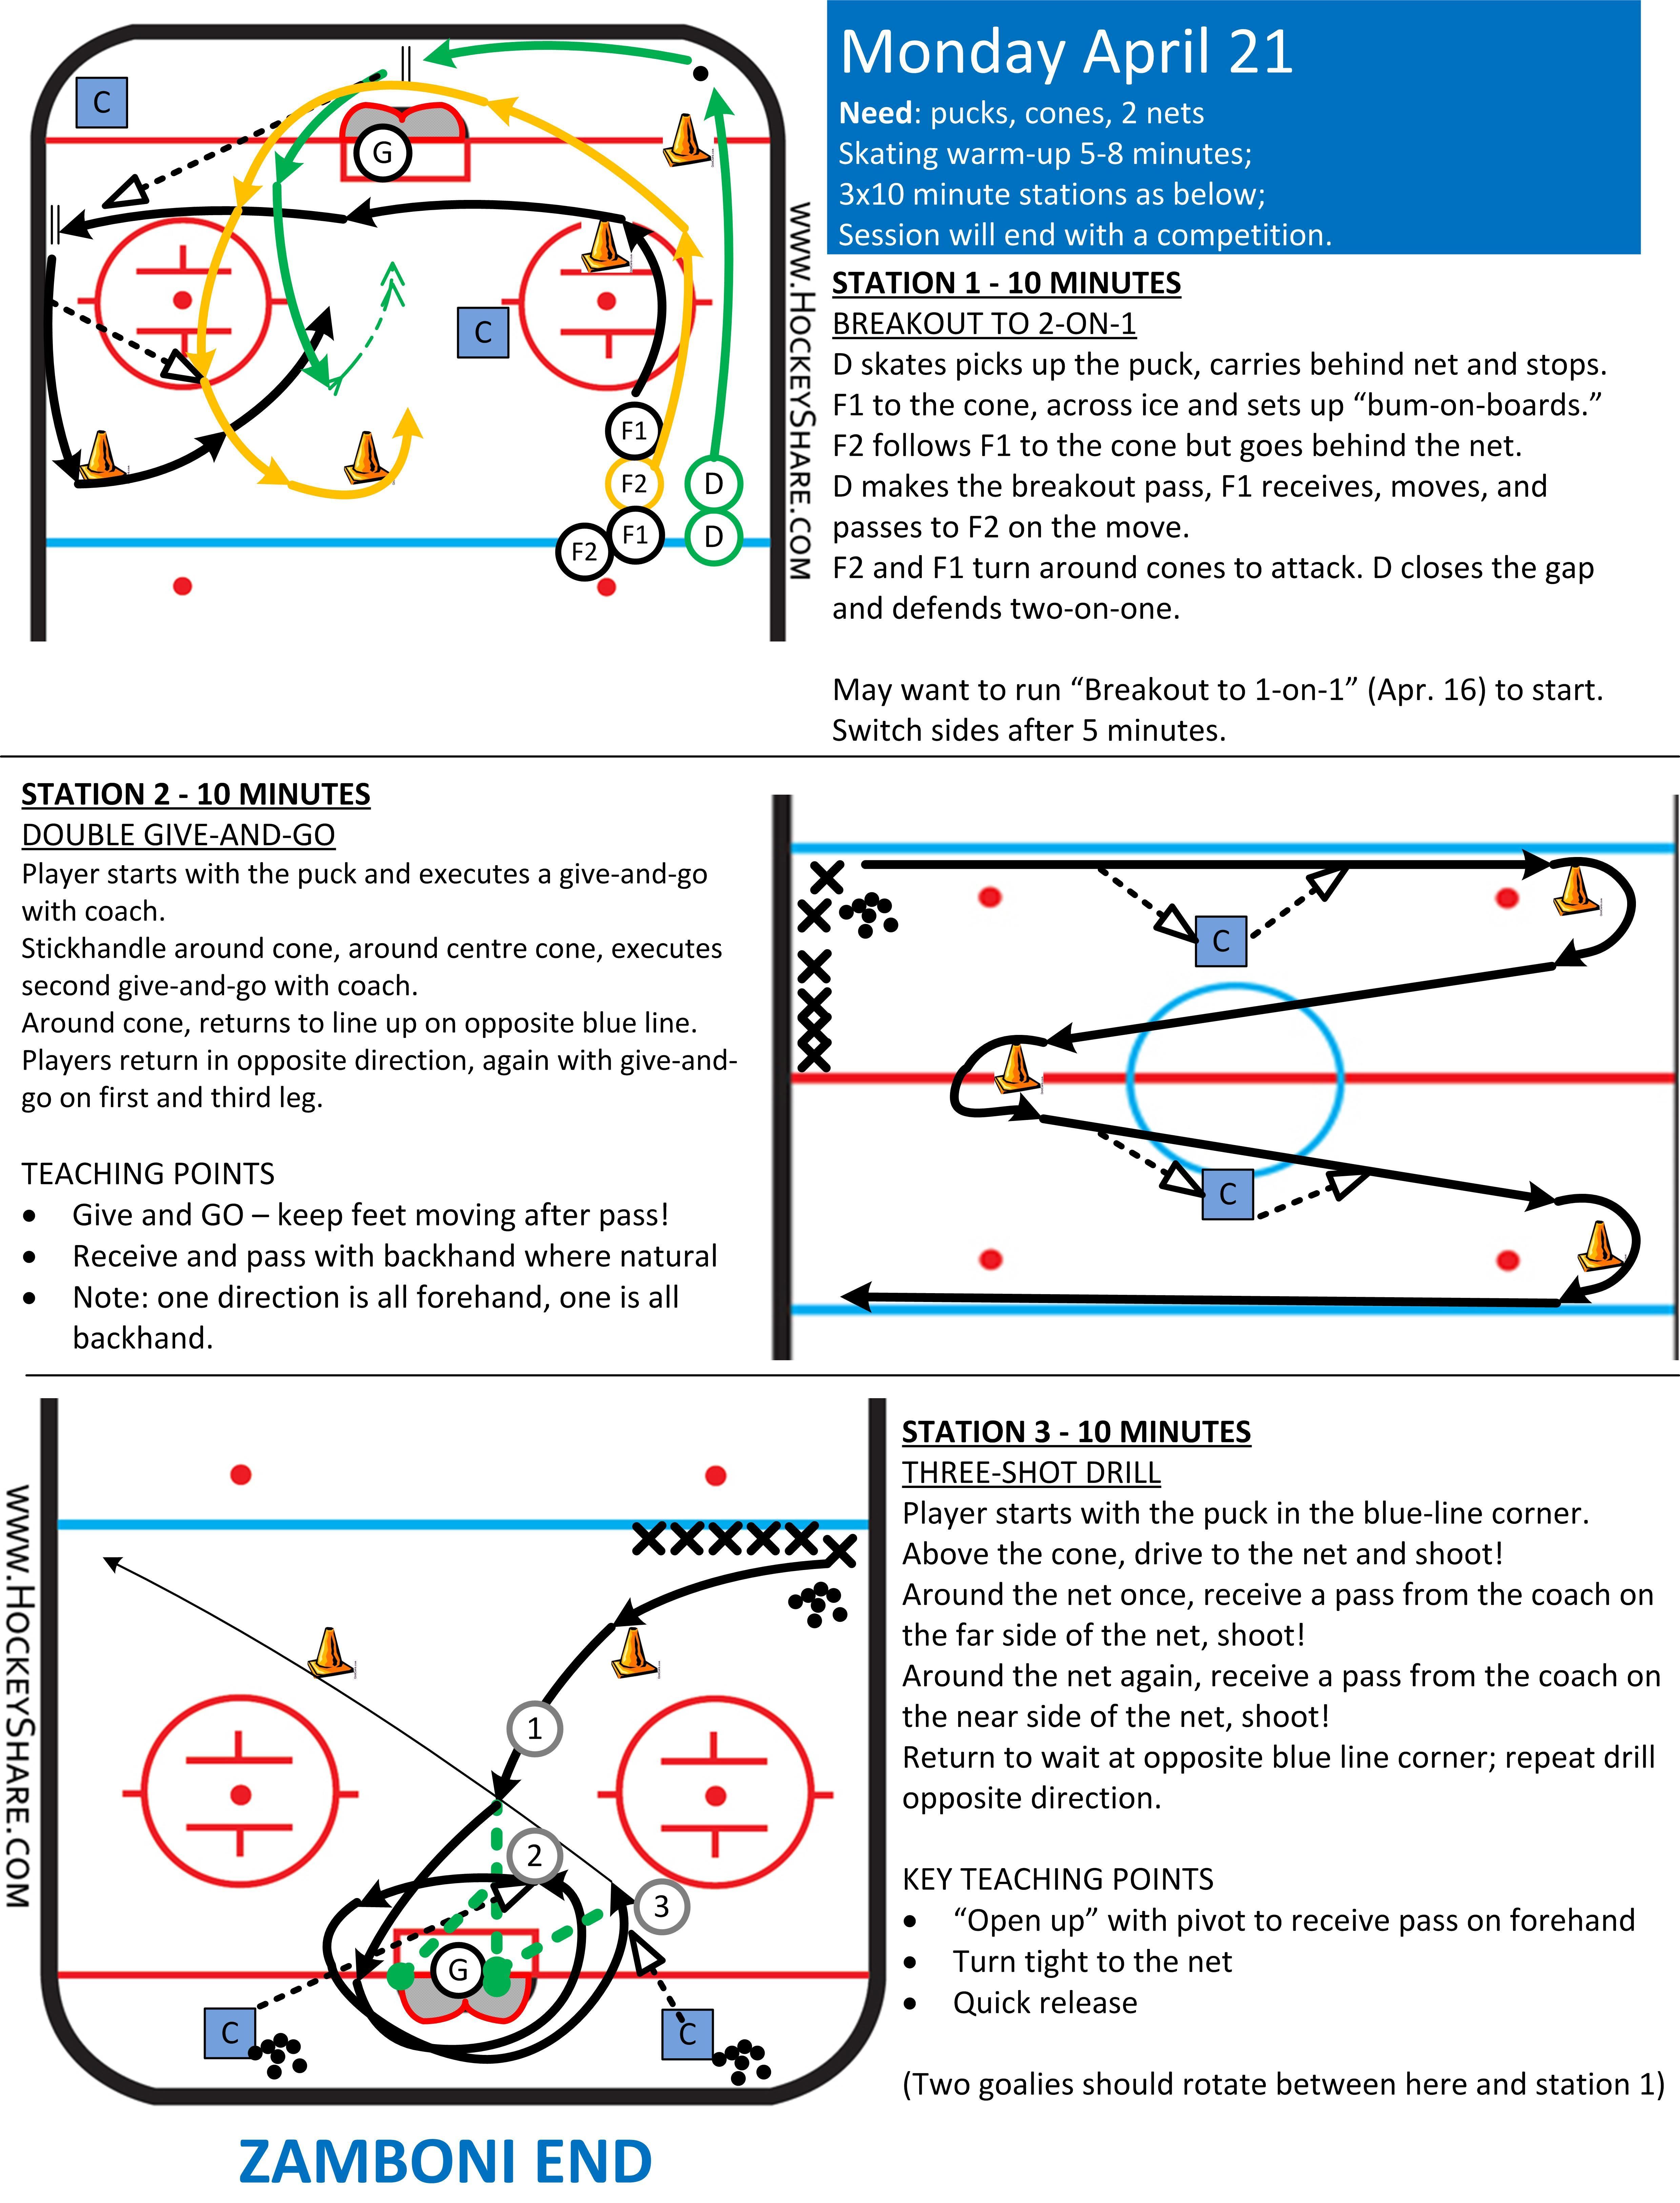 Full Ice Practice Plan For Novice U8 With Three Stations Hockey Drills Ice Hockey Hockey Workouts